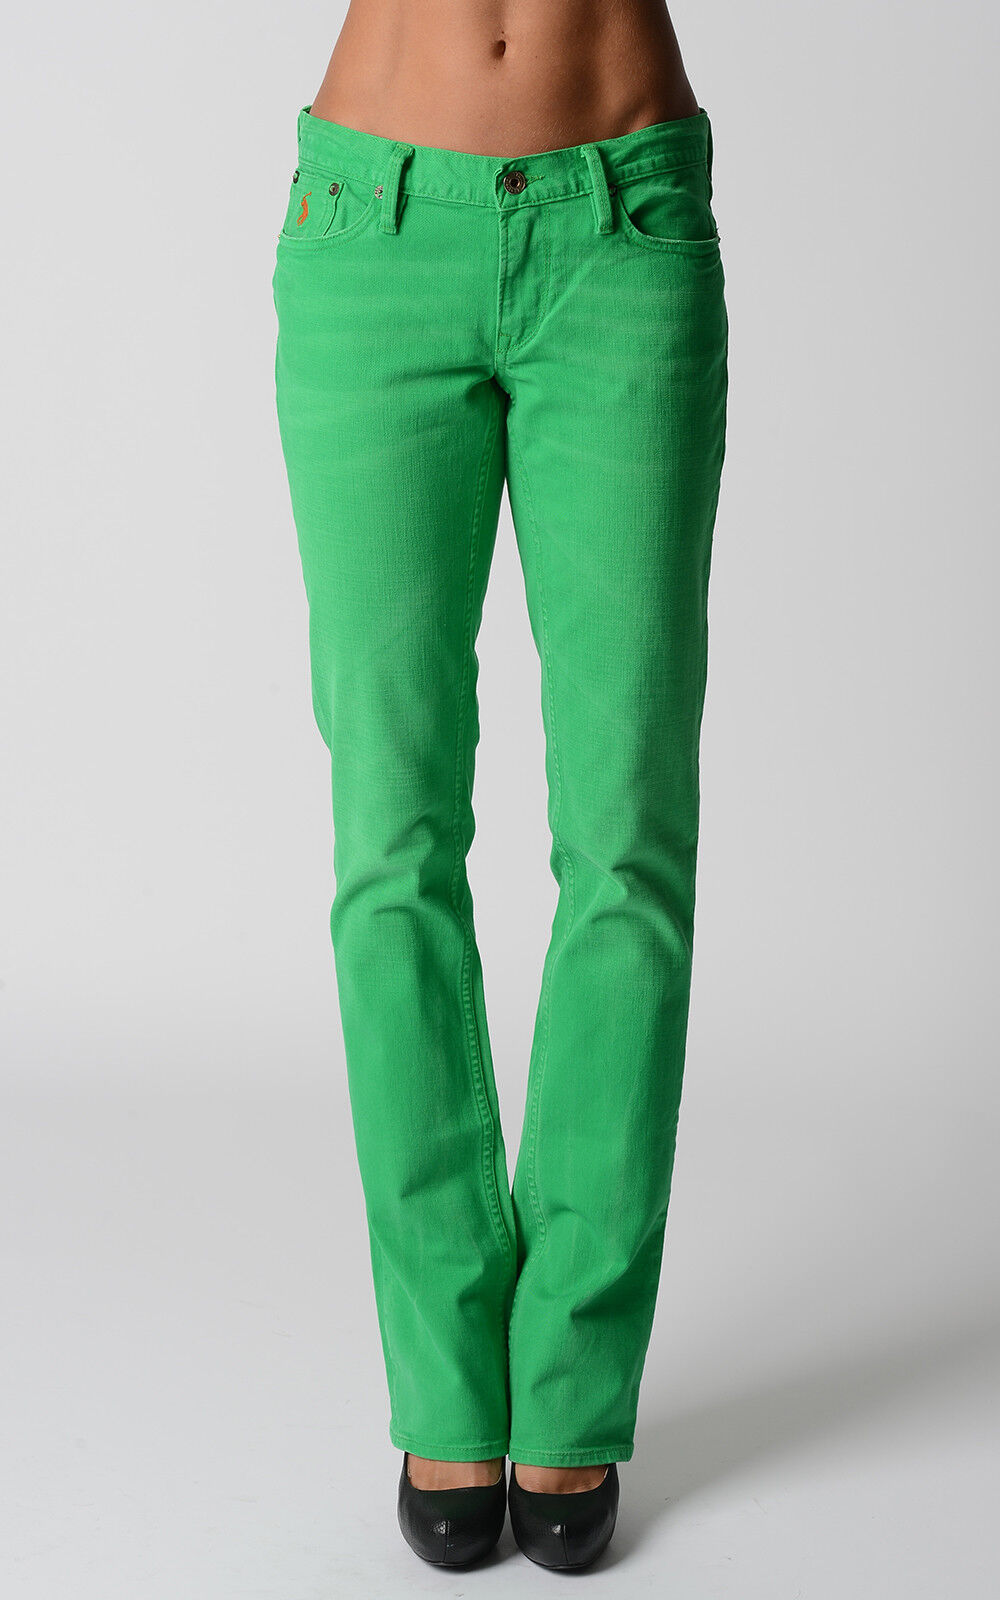 Ralph Lauren damen Jeans Madison Stiefel Grün Pants Gift For Her NWT